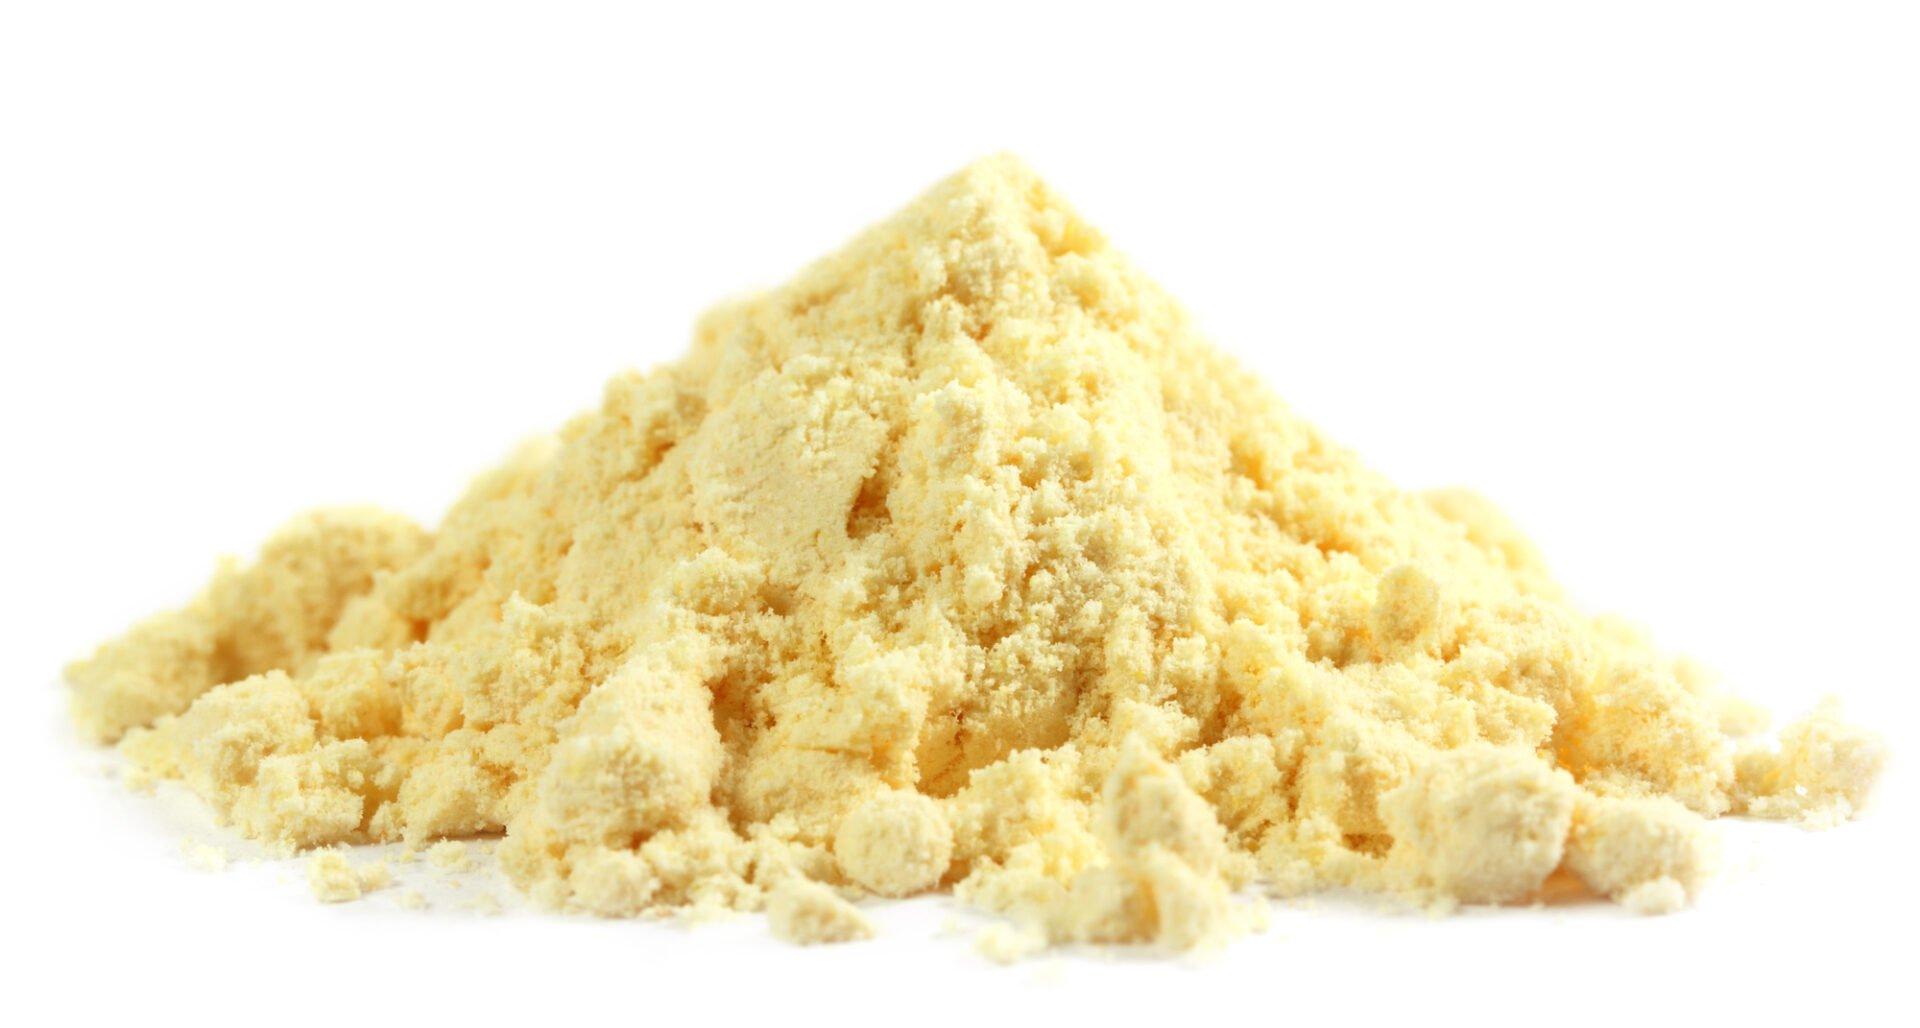 organic pea protein in powder form